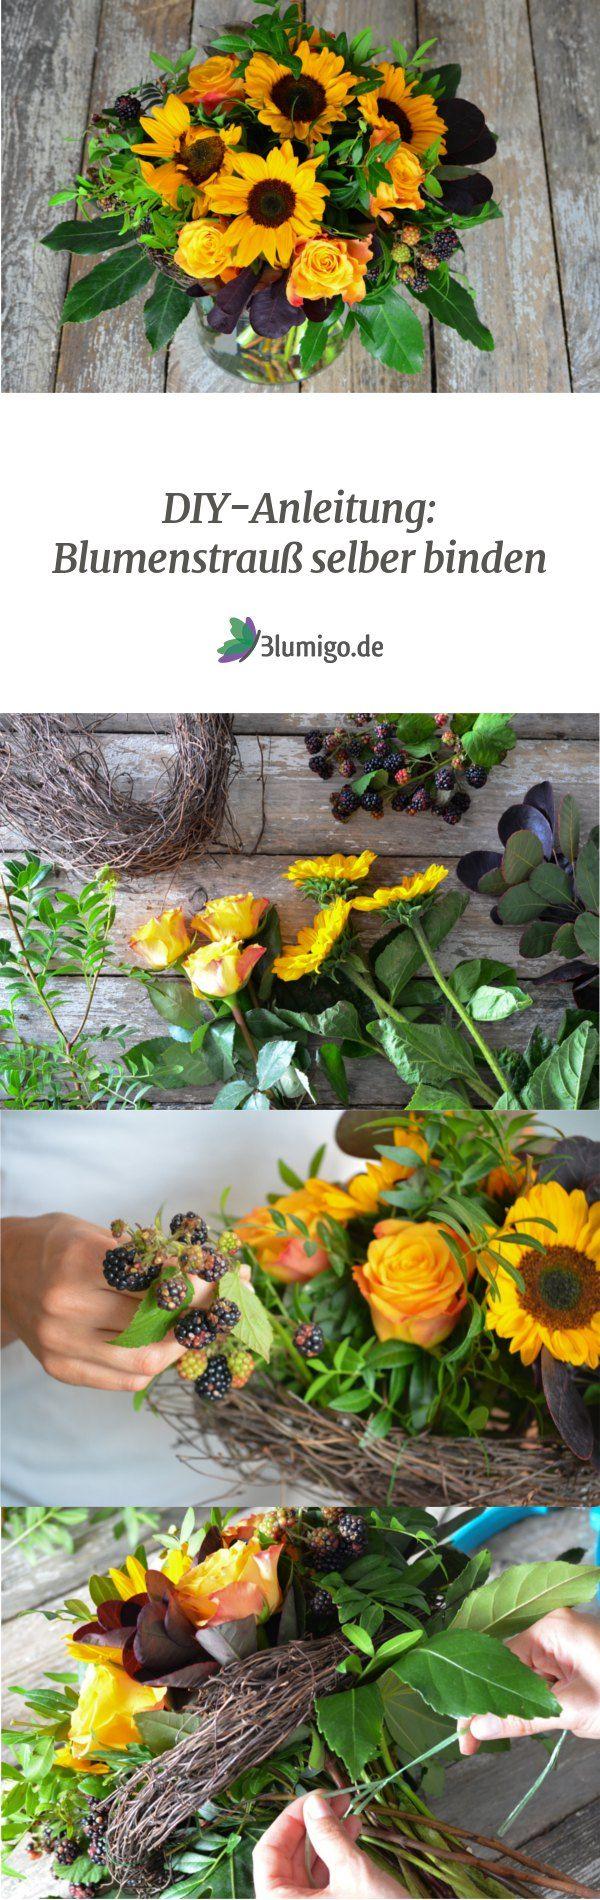 schones schone herbstblumen erfreuen unser auge im september beste images der bfccbadbfadfeacf